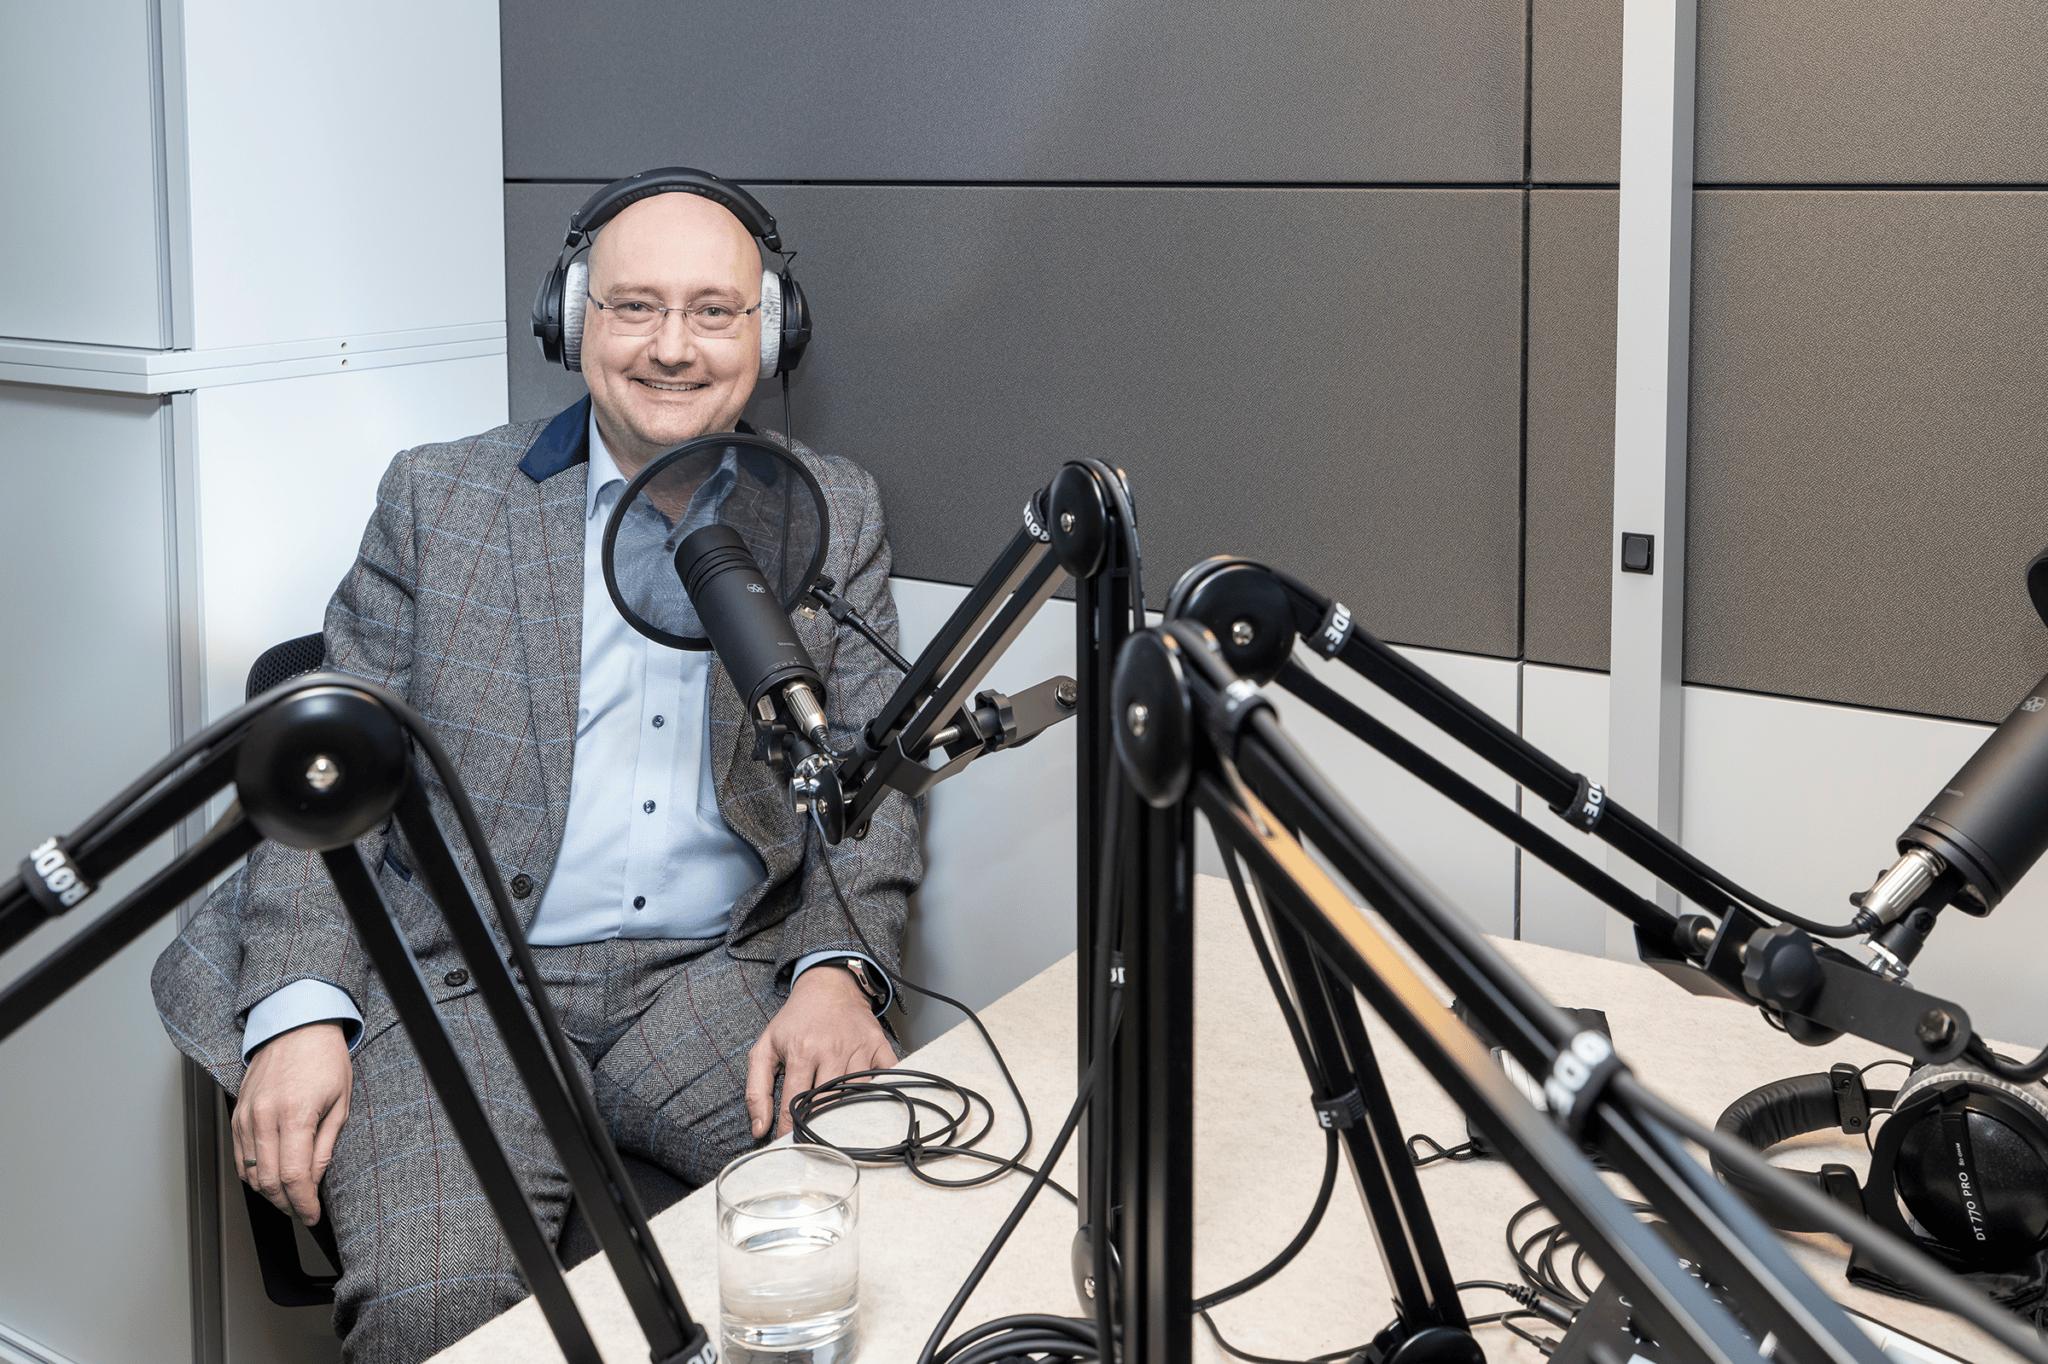 Roman Tobler sitzend im Podcast-Aufnahmestudio